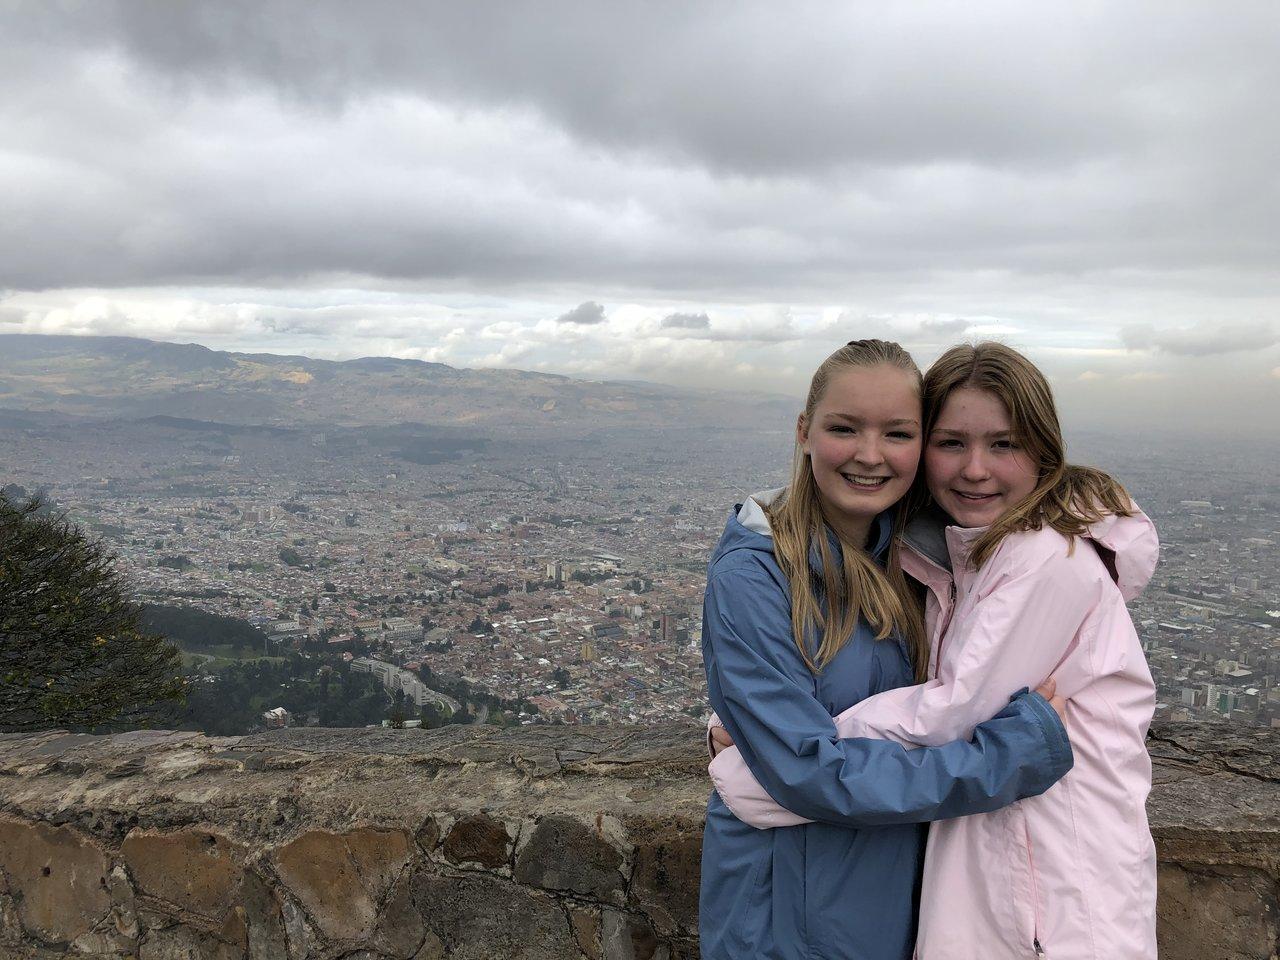 Monserrate, Bogota | Photo taken by Rachel B